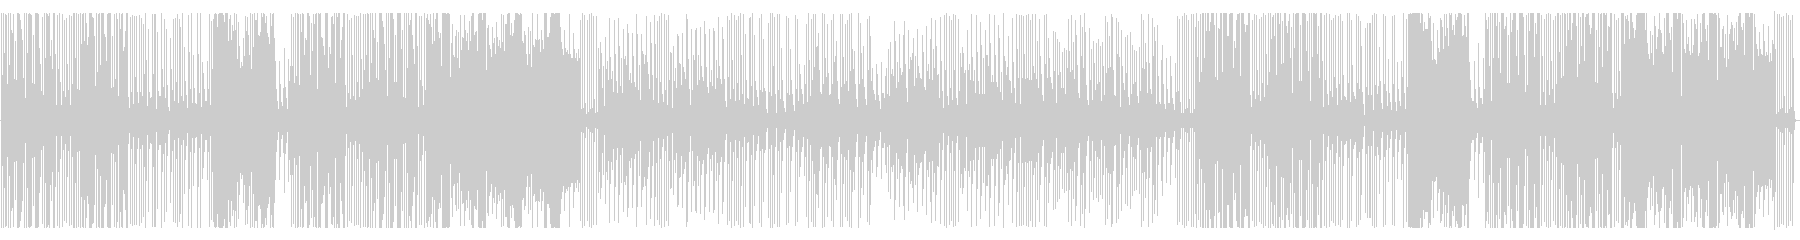 YouTube トロンボーン・軽快の未再生の波形